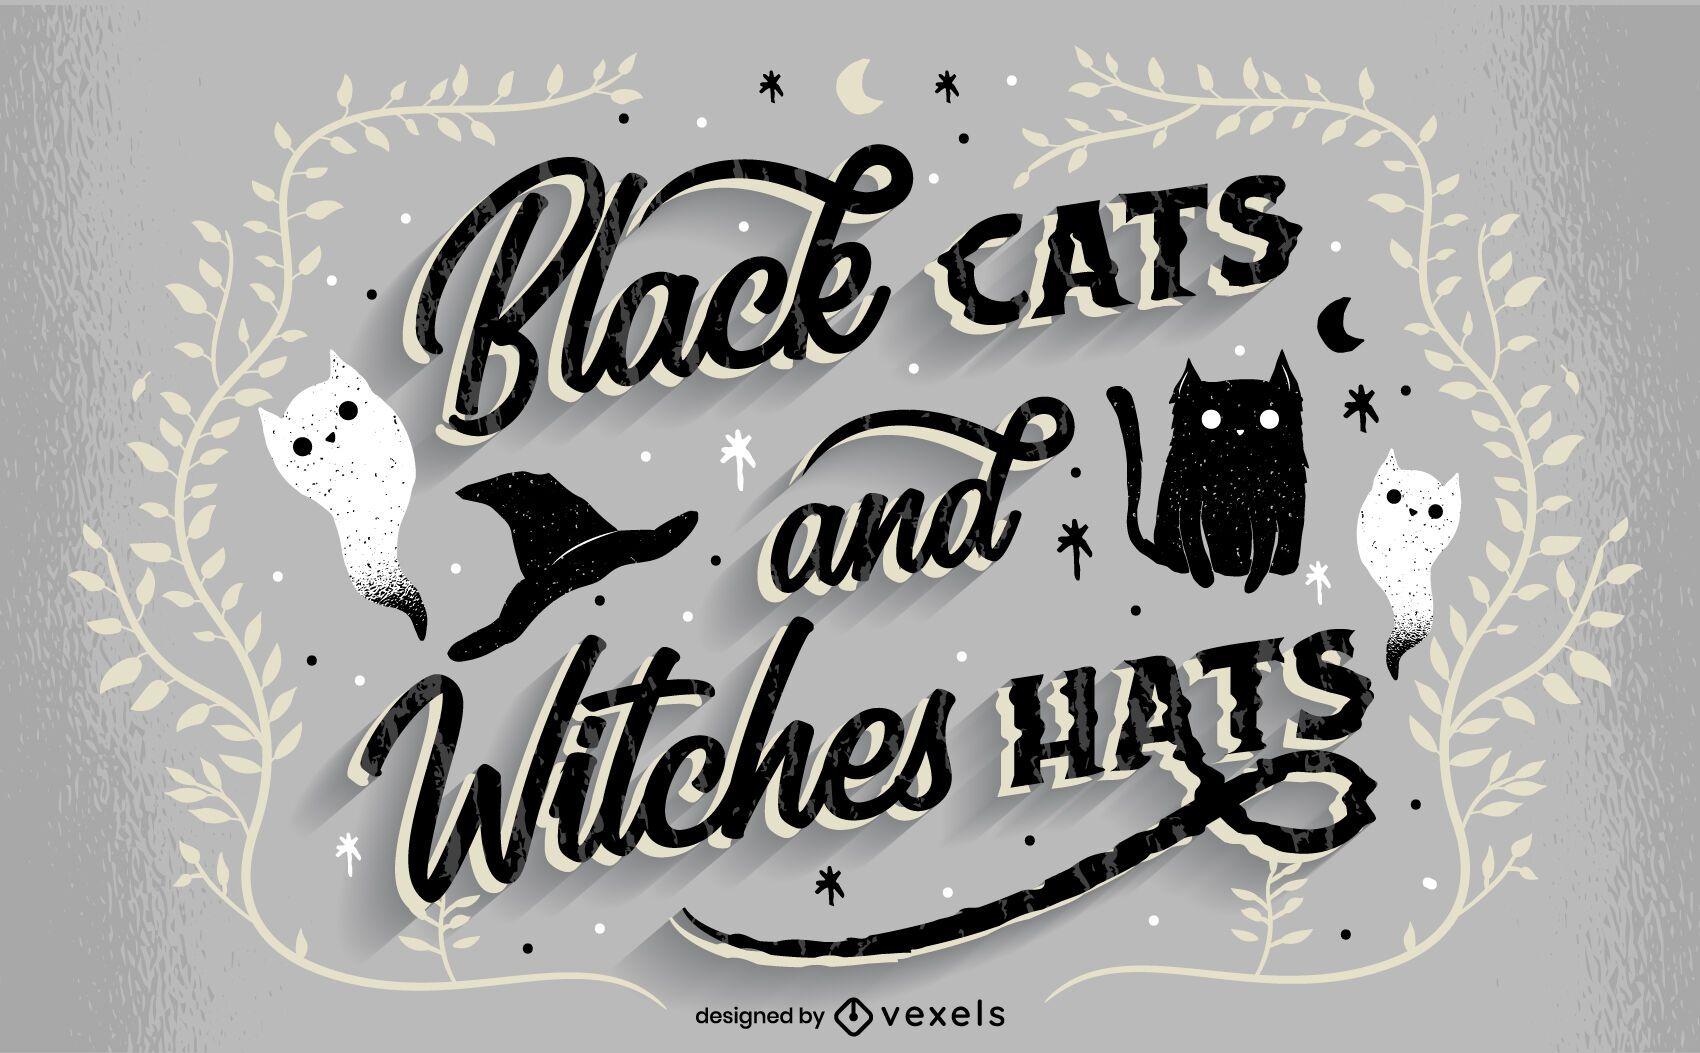 Black cats halloween lettering